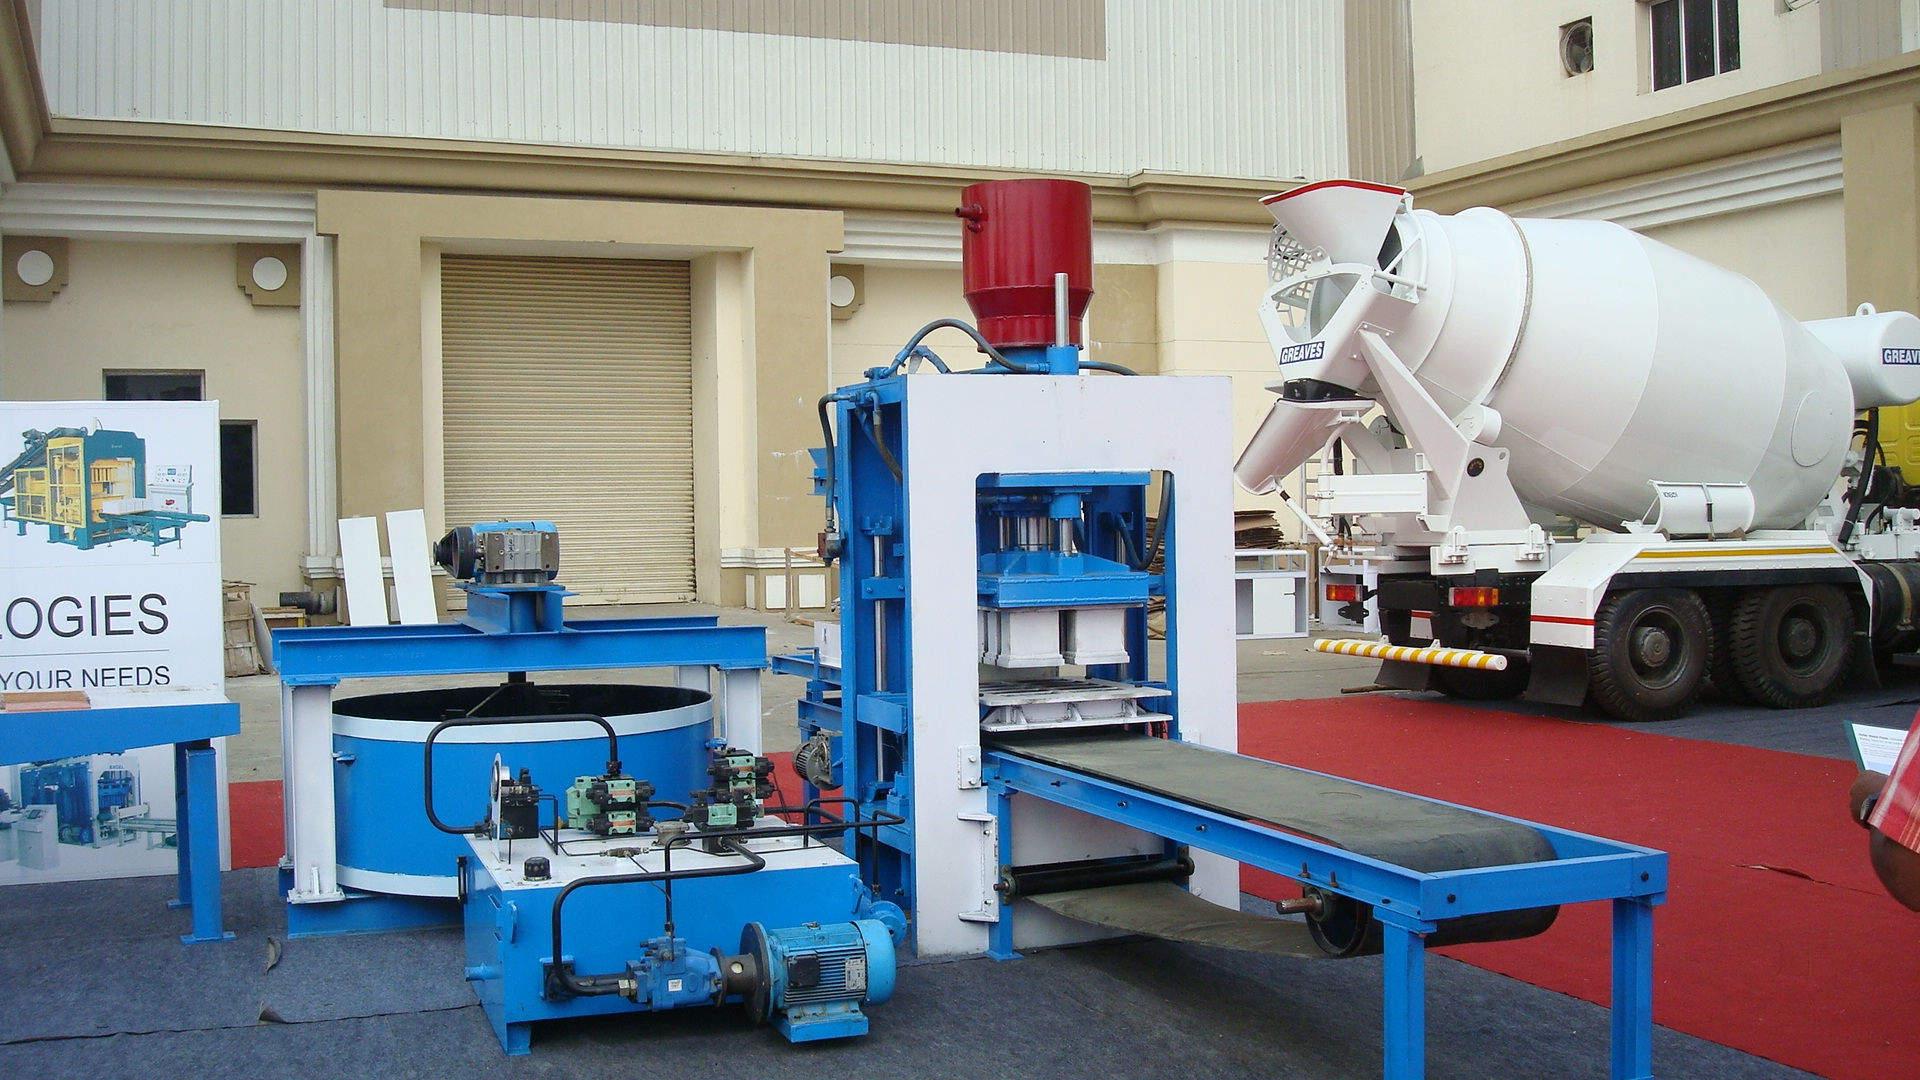 Top Interlocking Paver Block Pvc Mould Manufacturers in